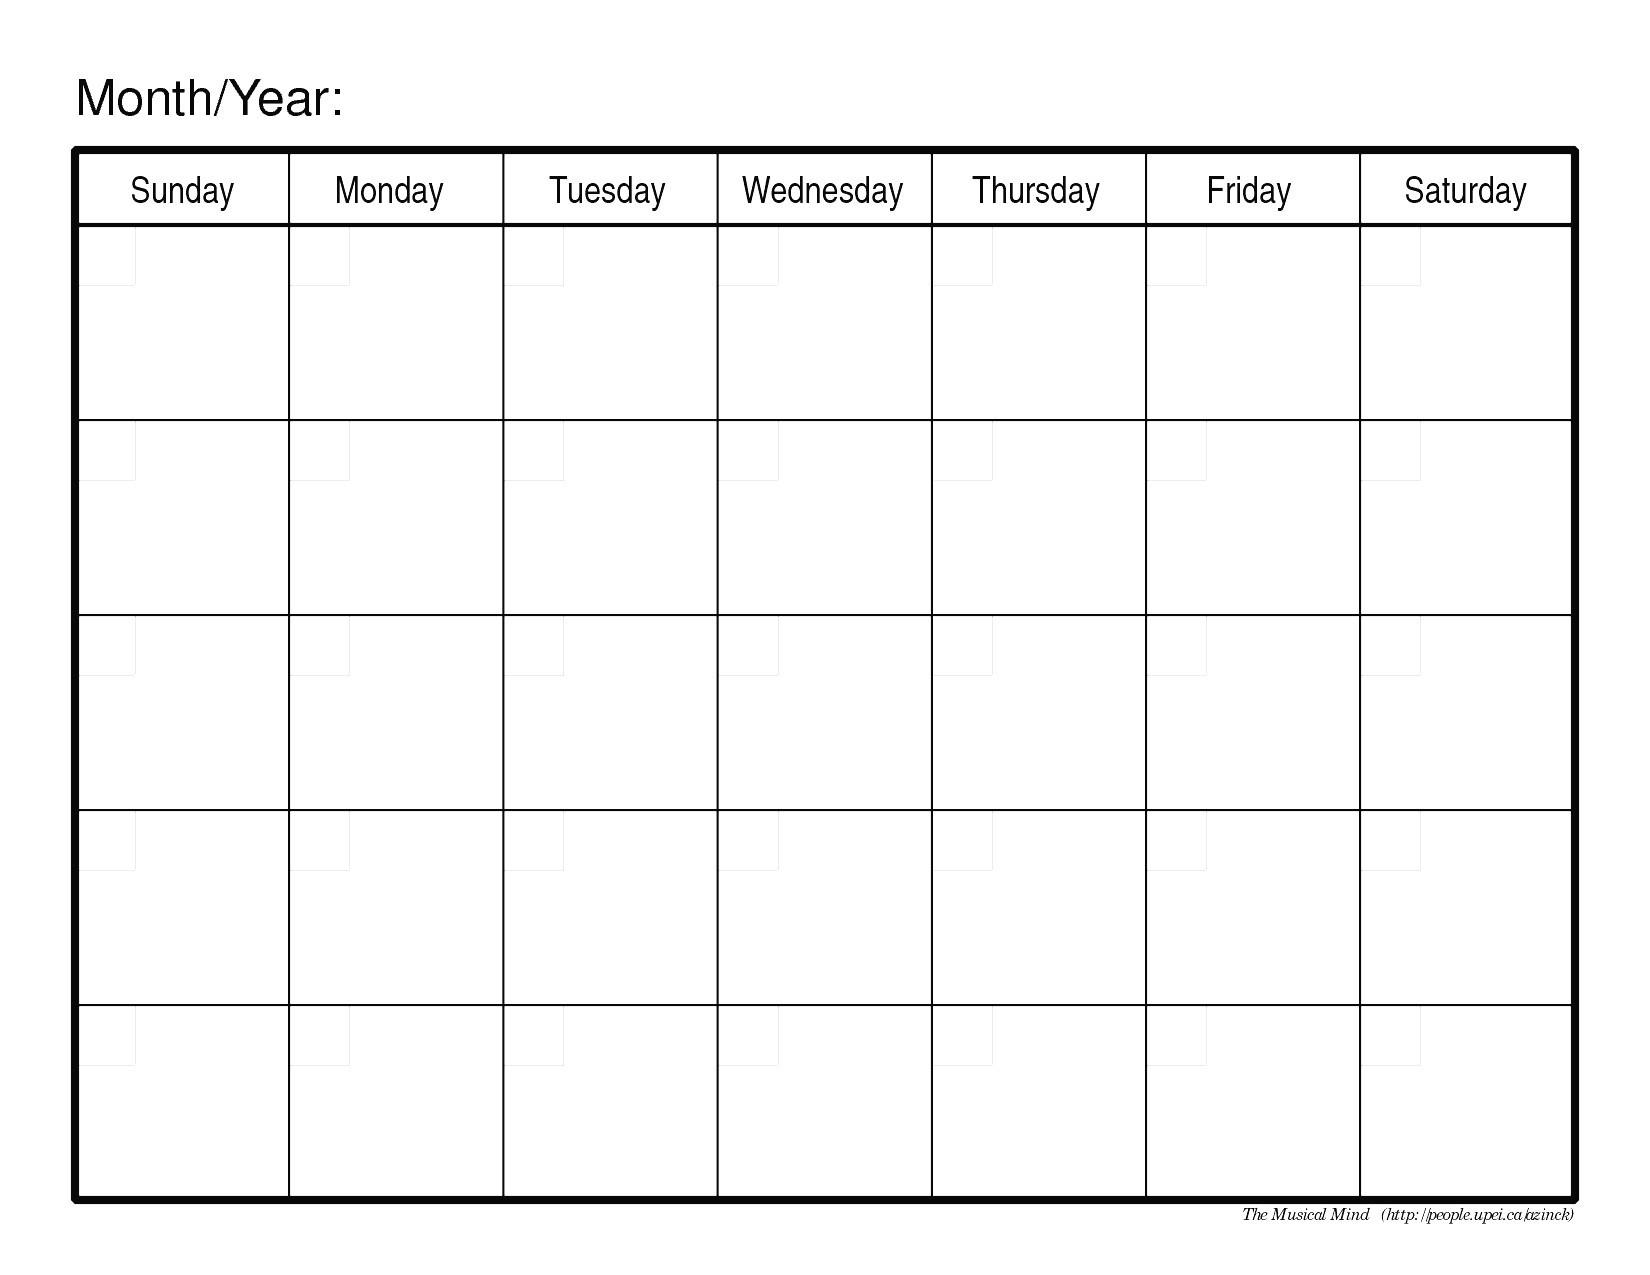 Calendar Month Template 1 With Calendar Month Template - Free regarding Template For Calendar By Month